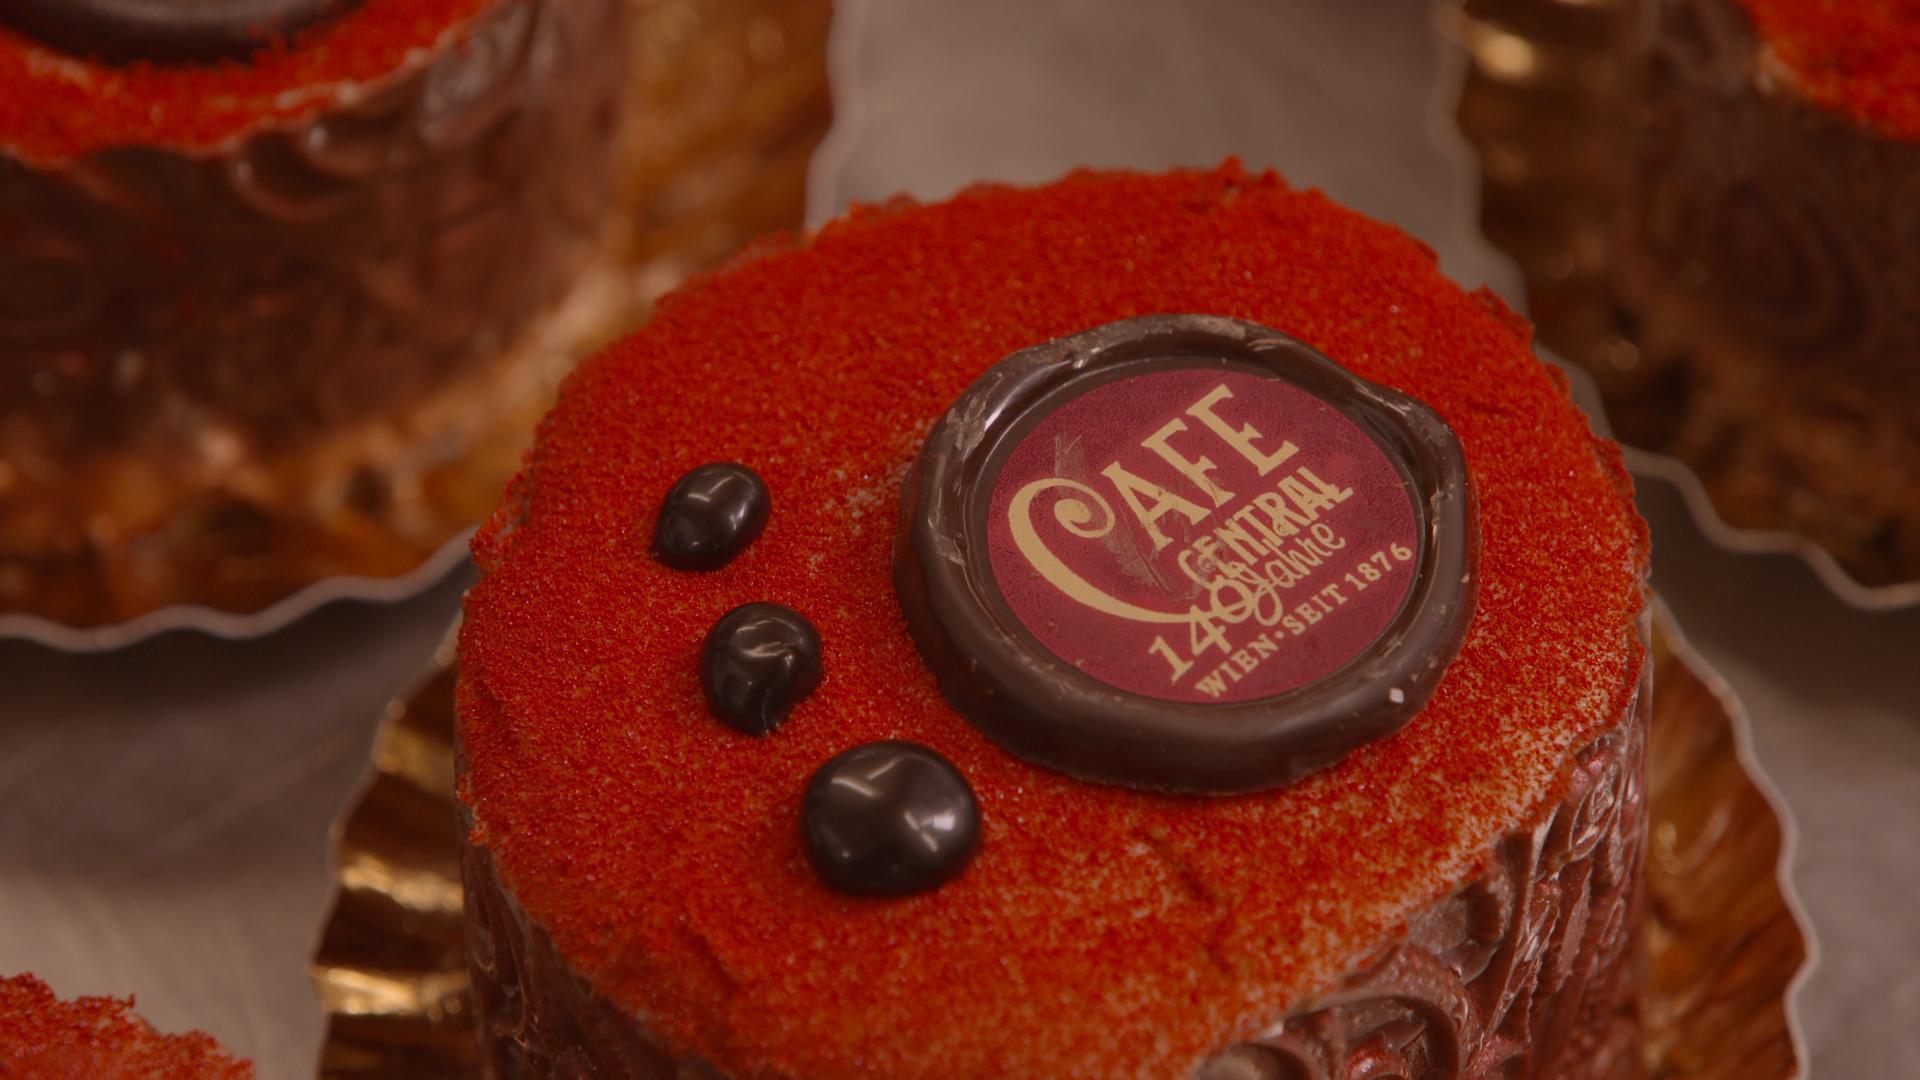 VHH_Glanz-des-alten-Adels_05_Café-Central-Torte- -Clever-Contents-Filmproduktion